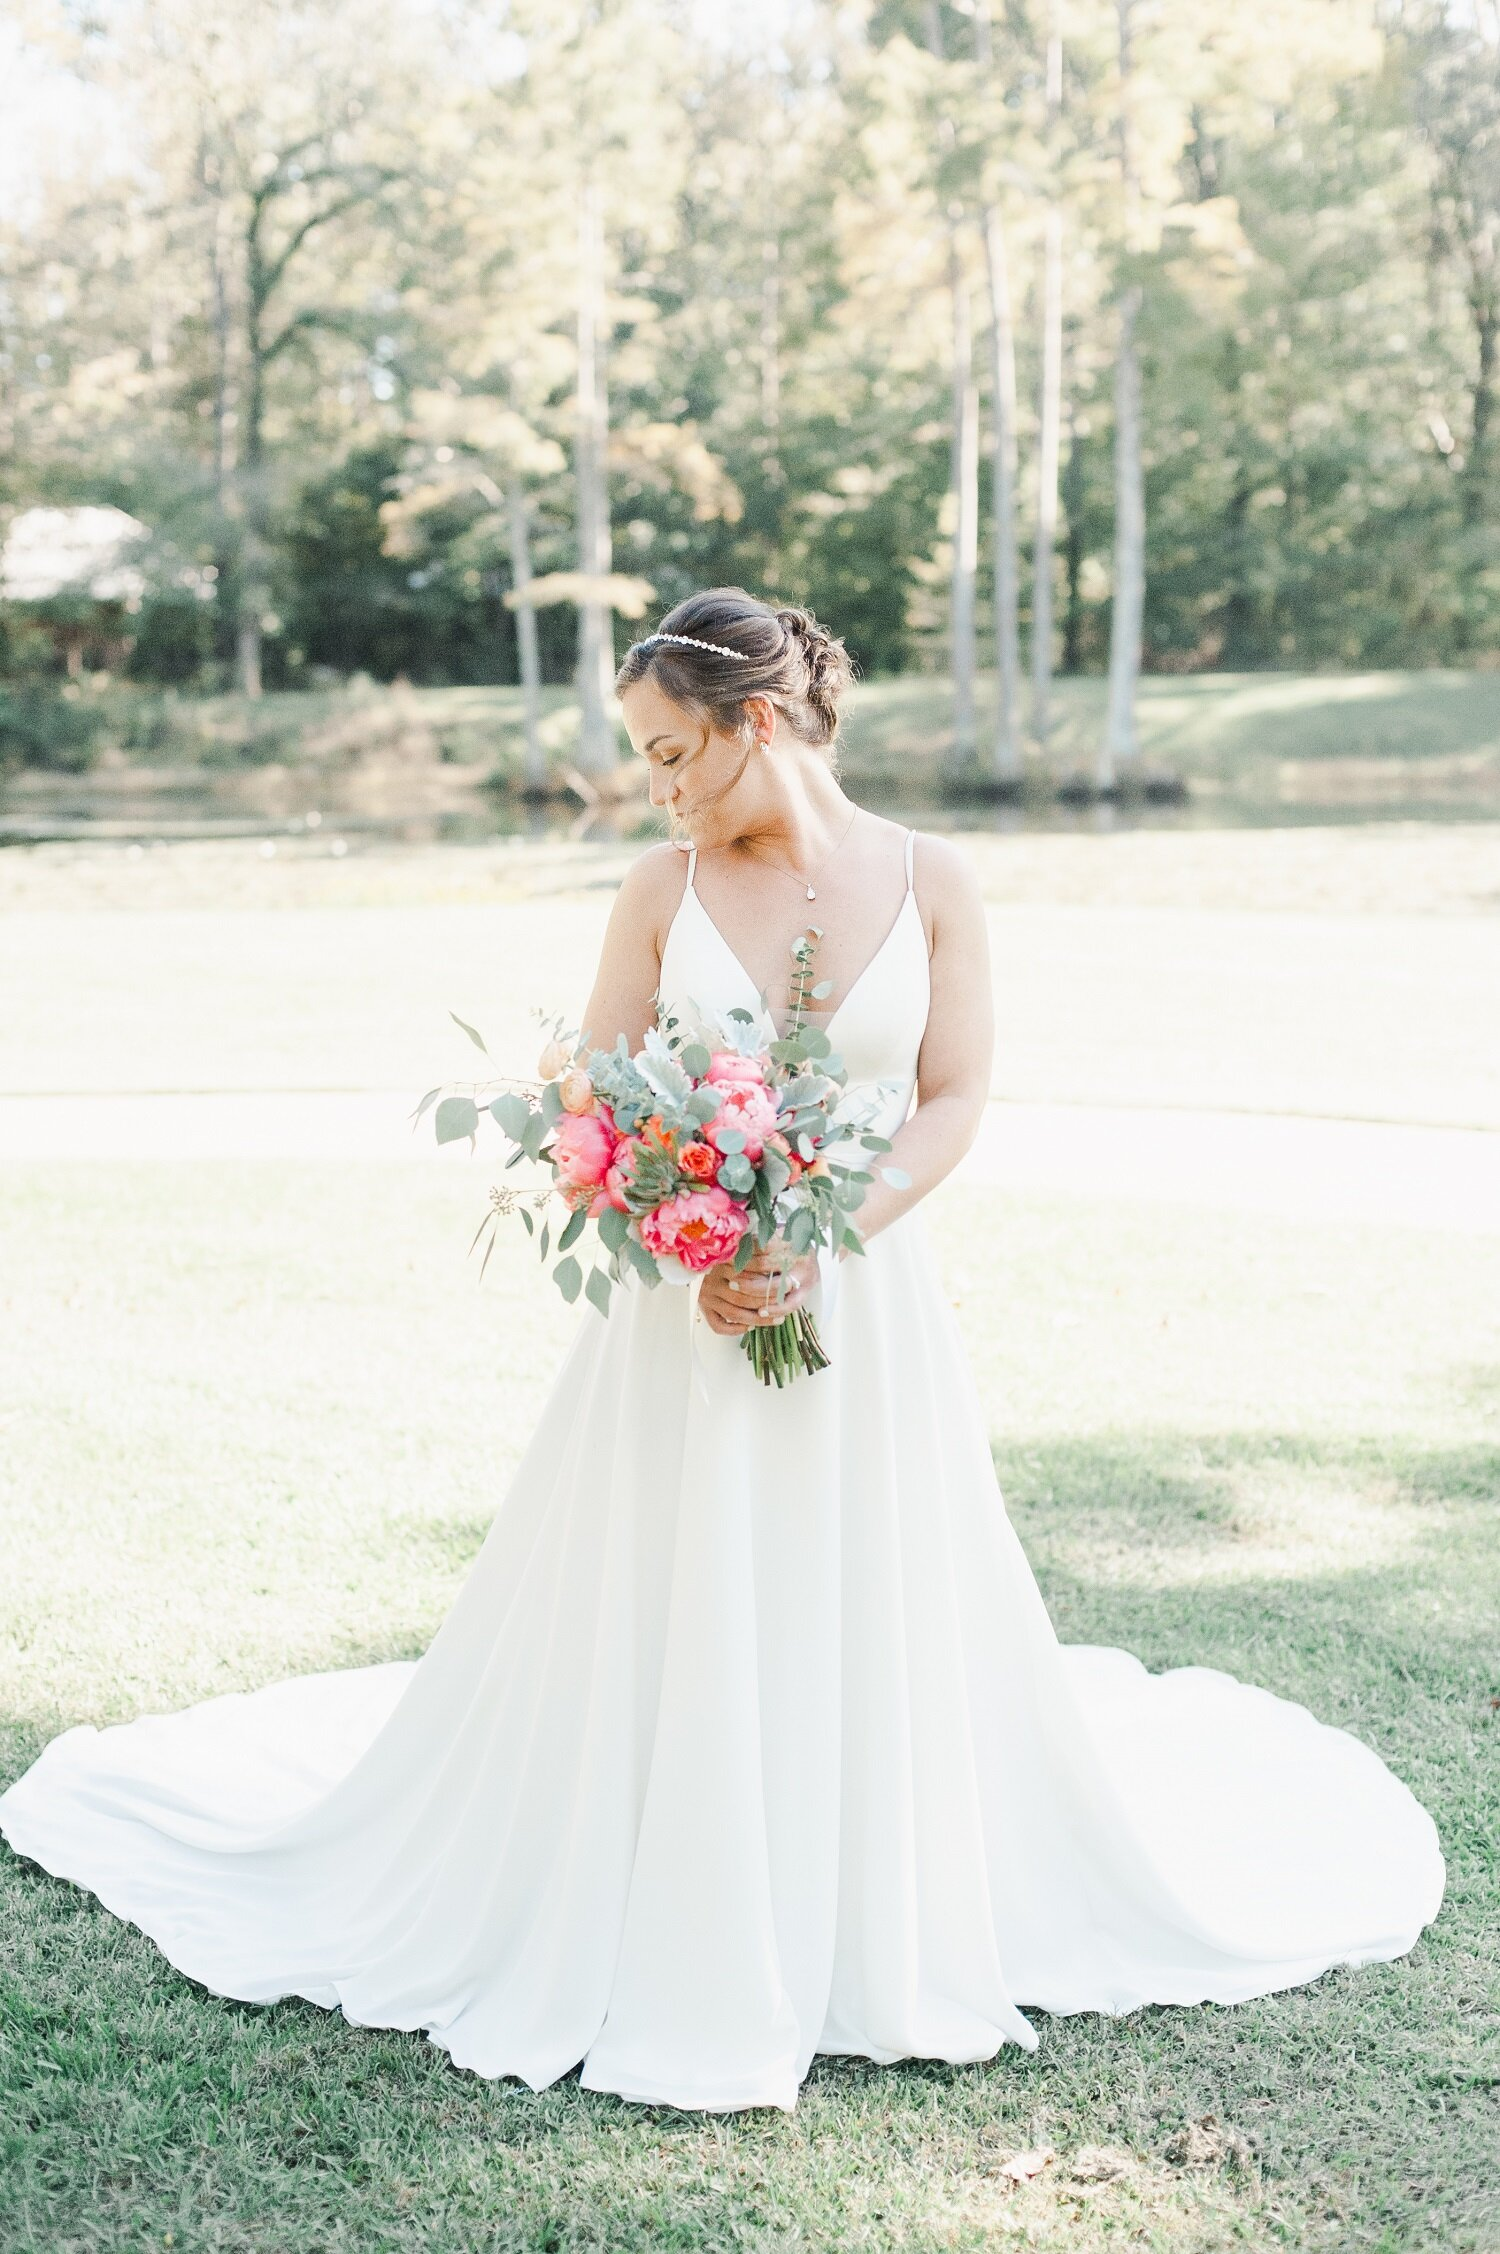 Gamberi Wedding - Shea's Favorites 4.jpg